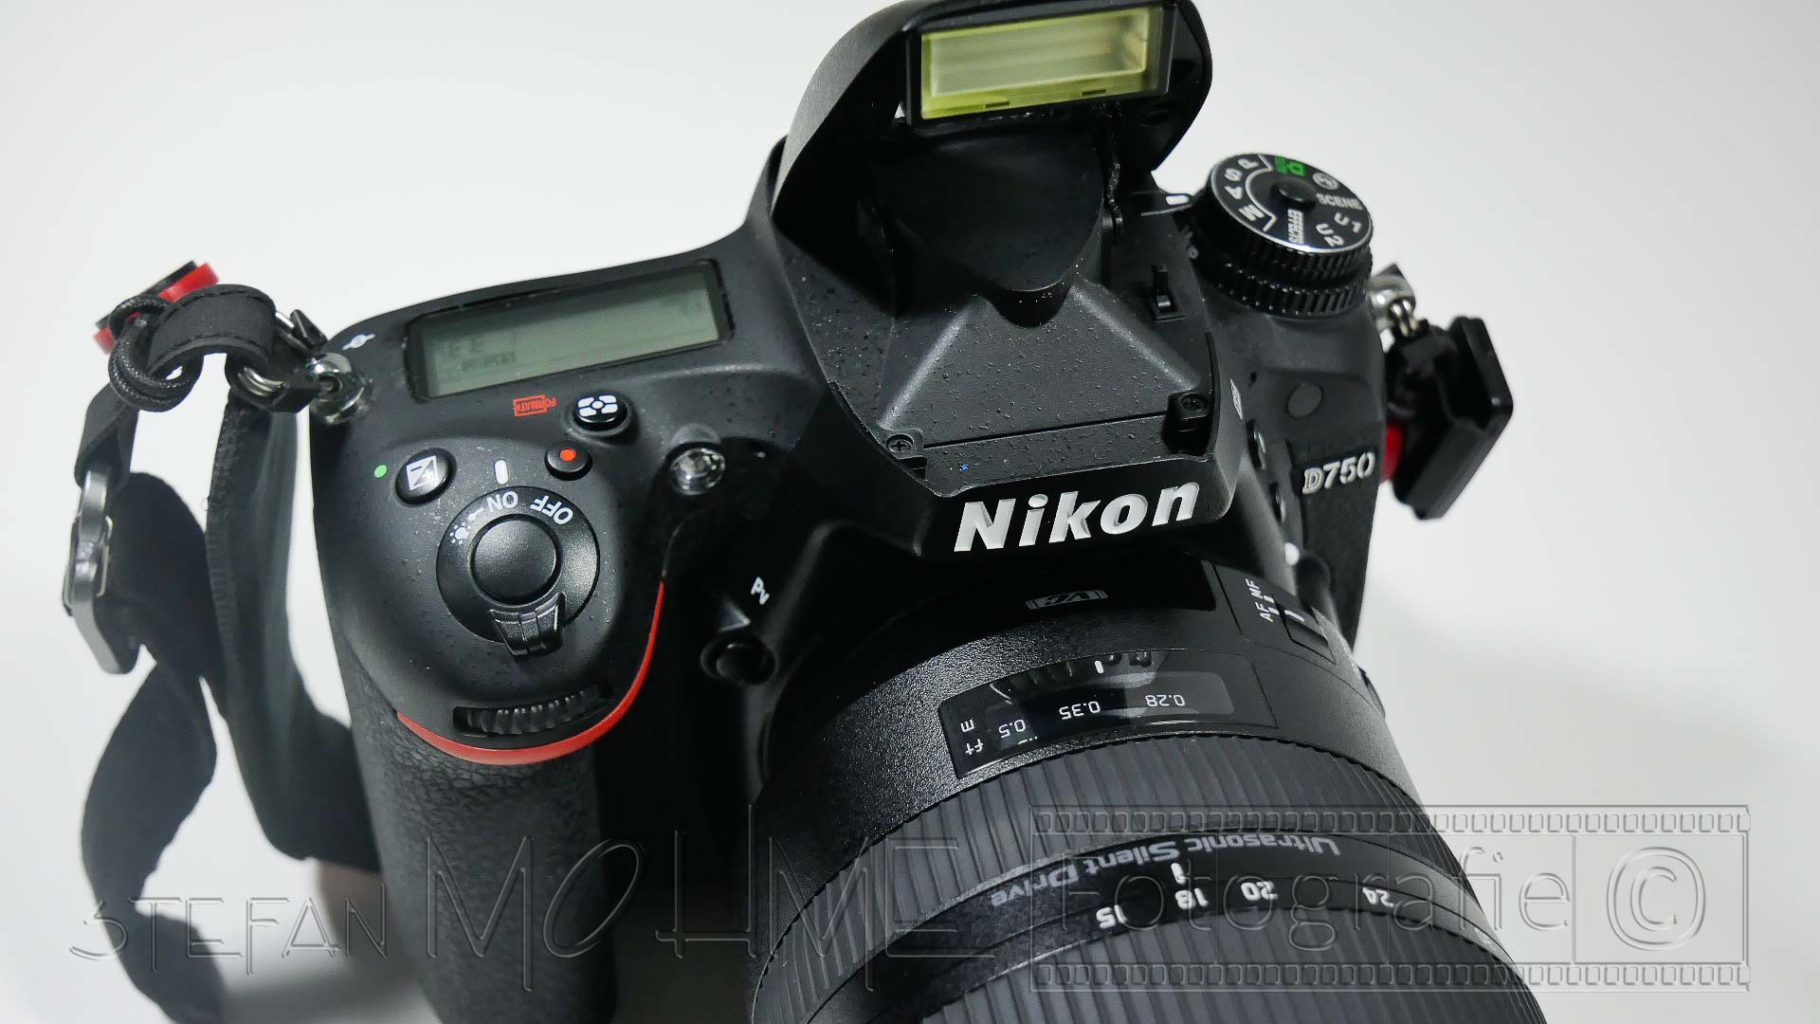 Blitz,Body,nahaufnahme,details,nikon,d750